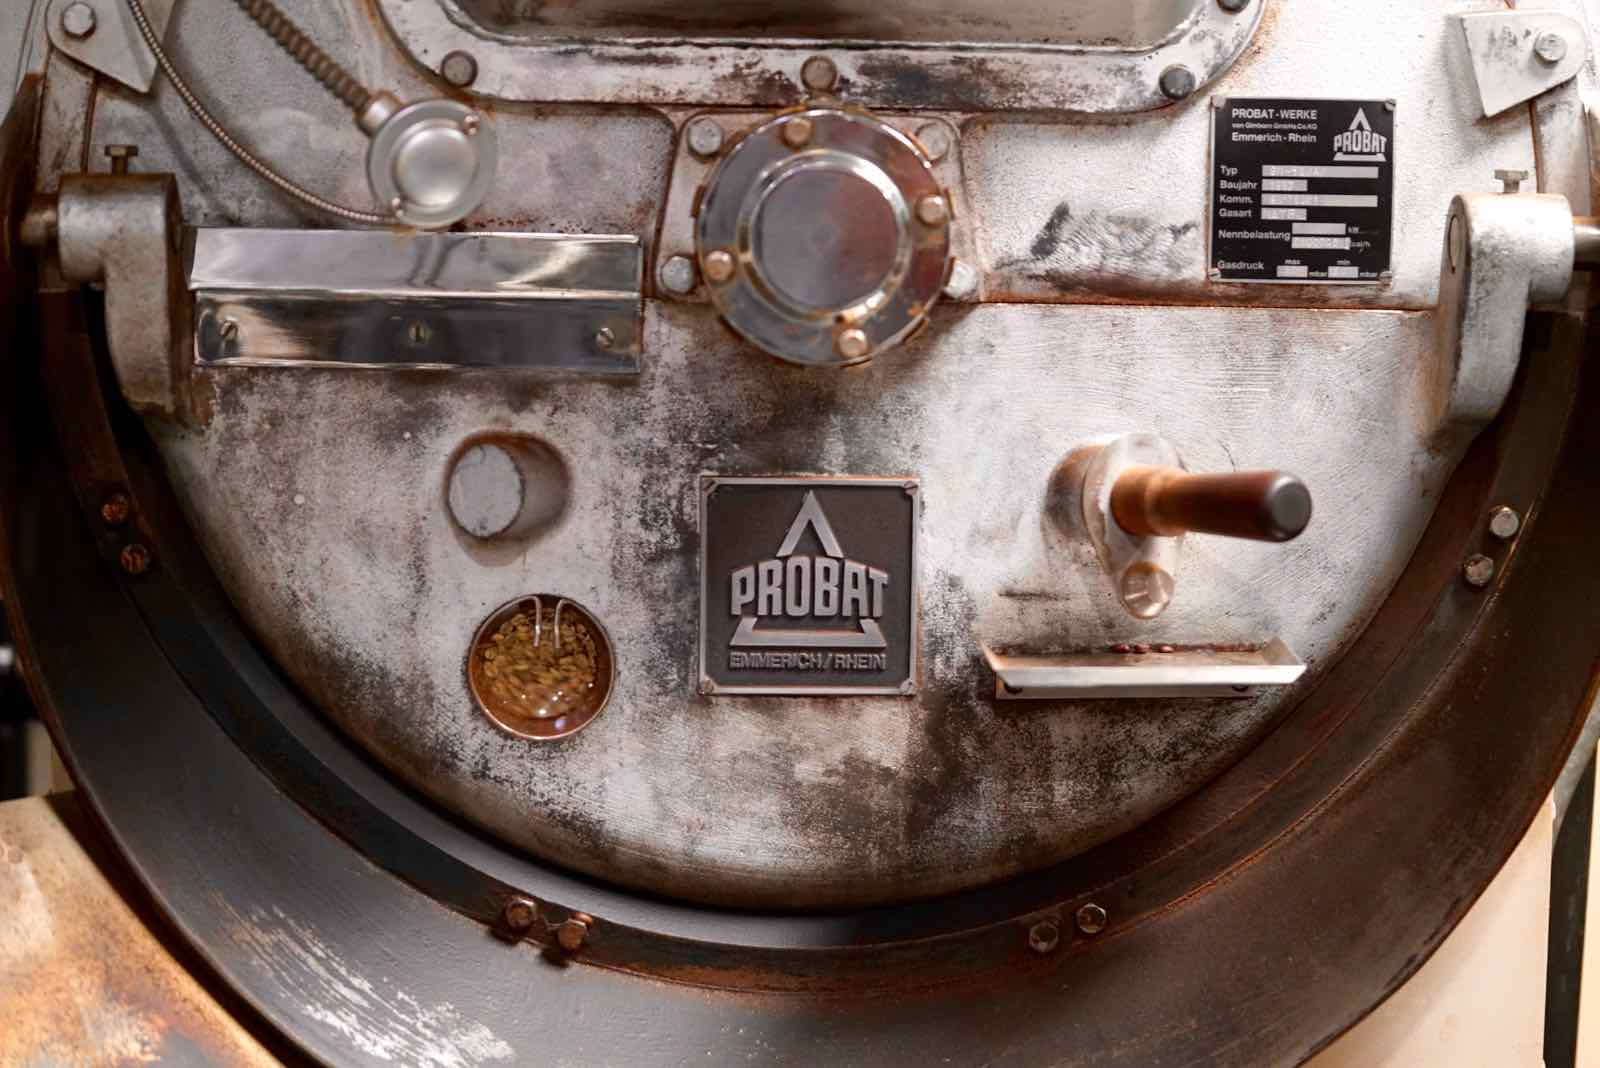 lamill-coffee-factory-tour-6.jpg